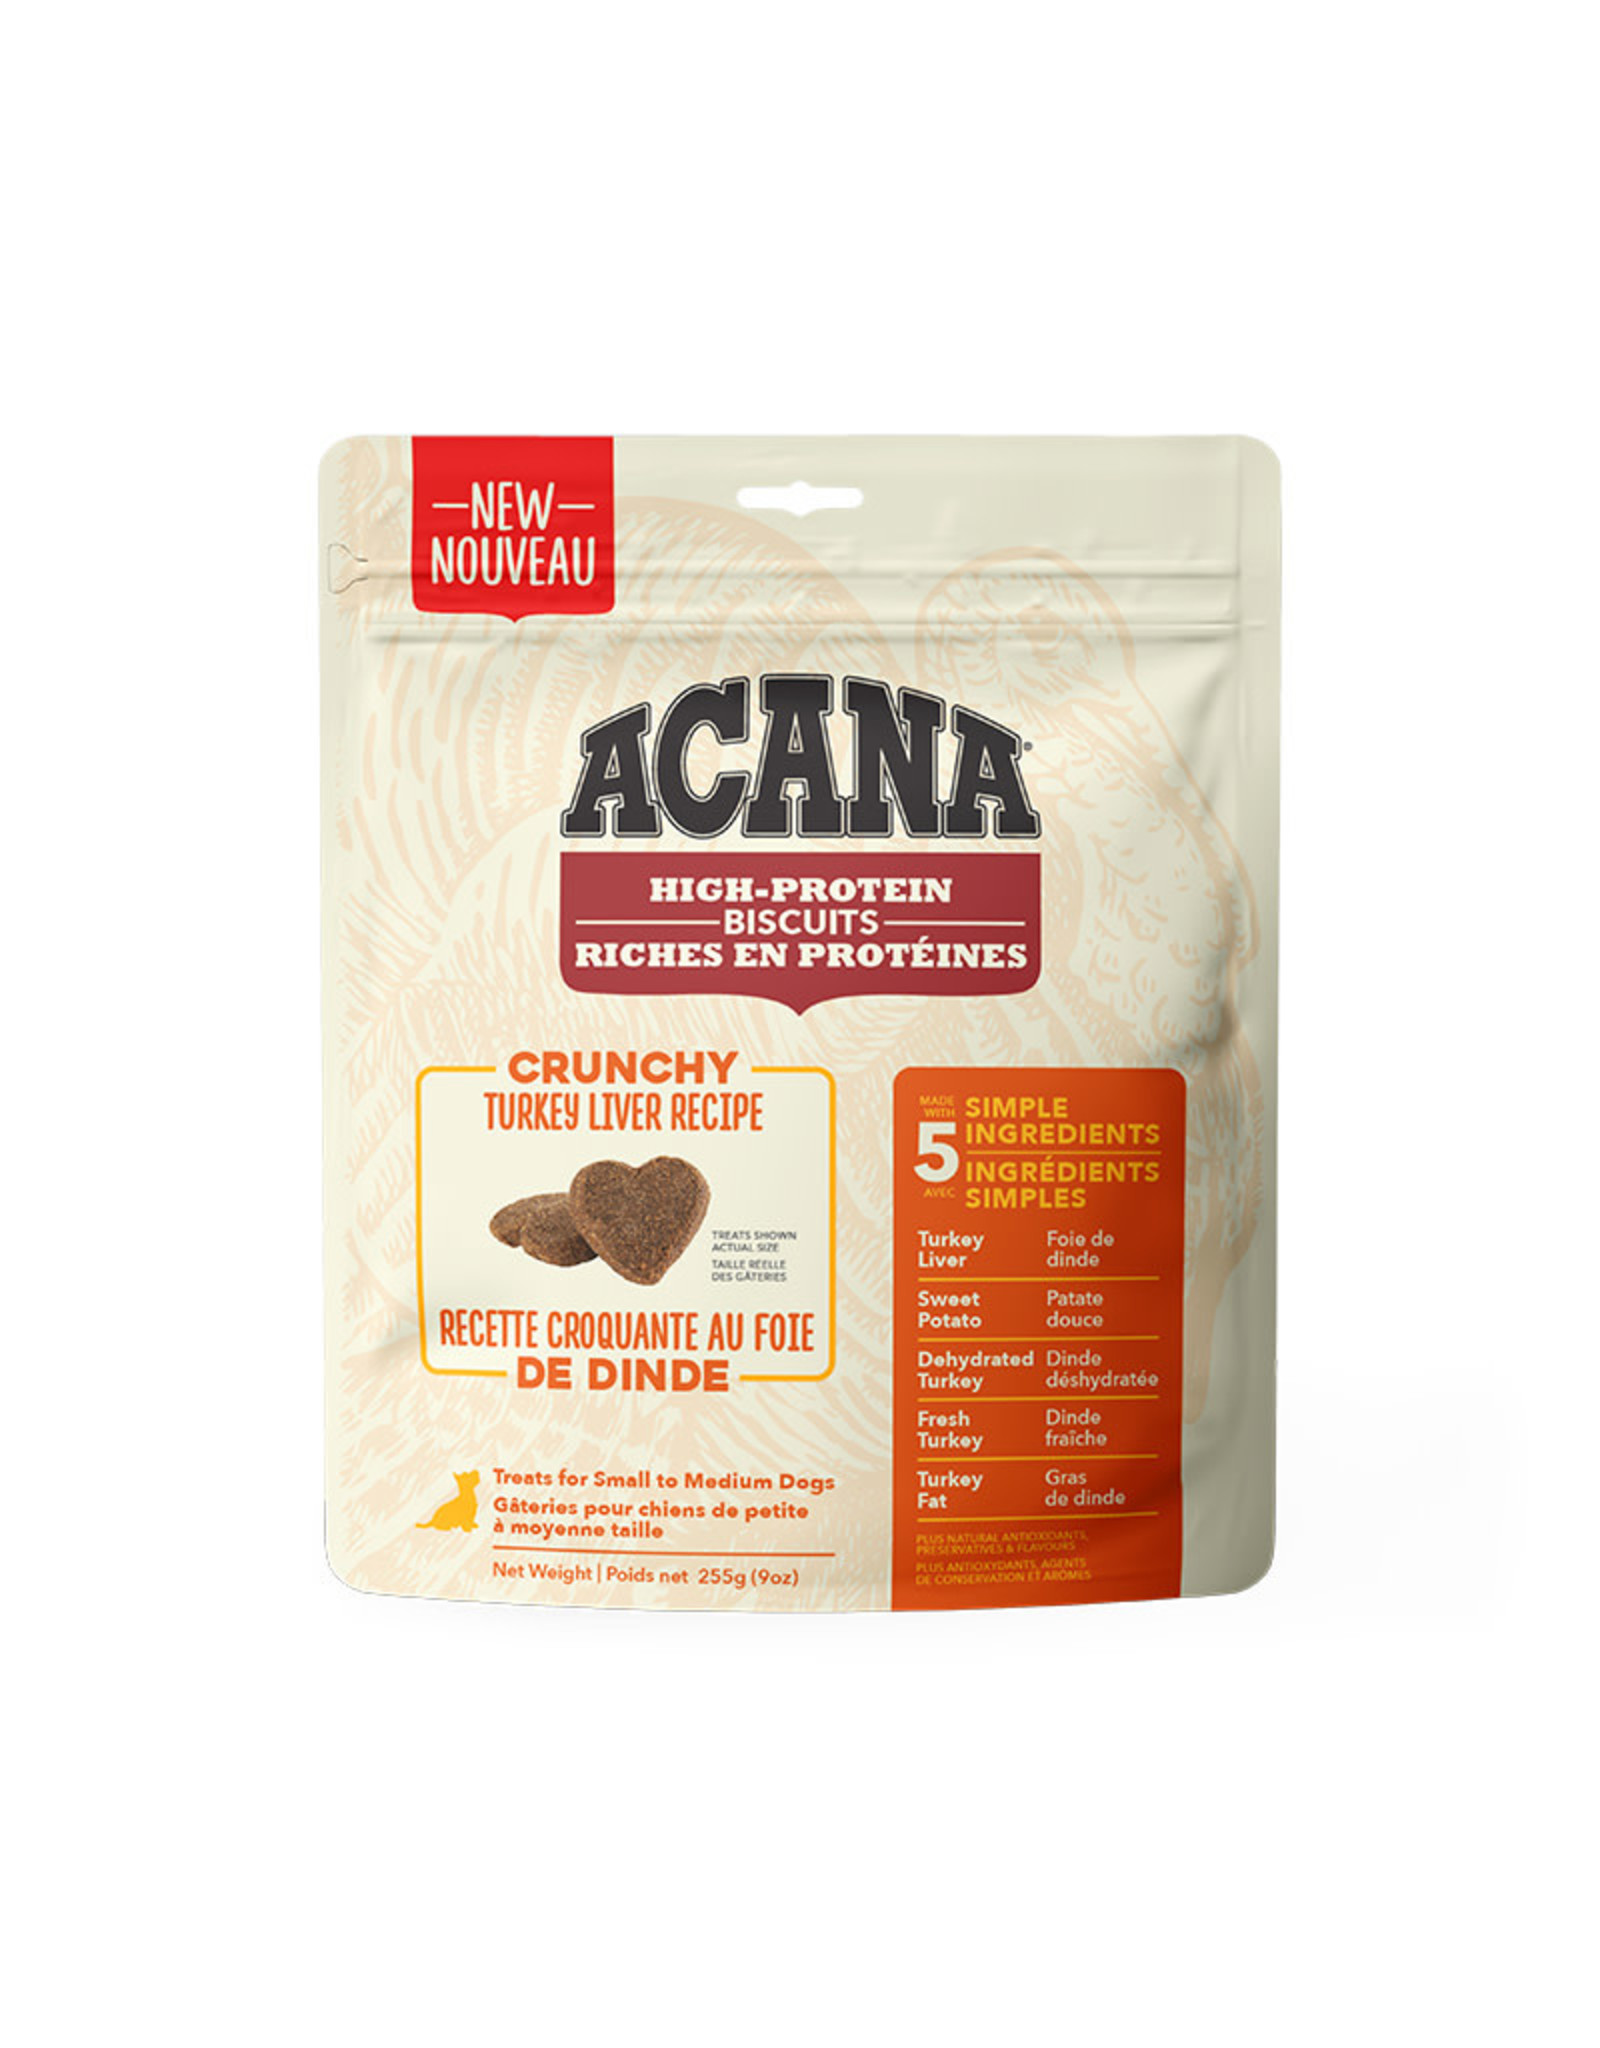 ACANA Acana DOG Biscuits - Crunchy Turkey Liver Recipe 255g  - S/M